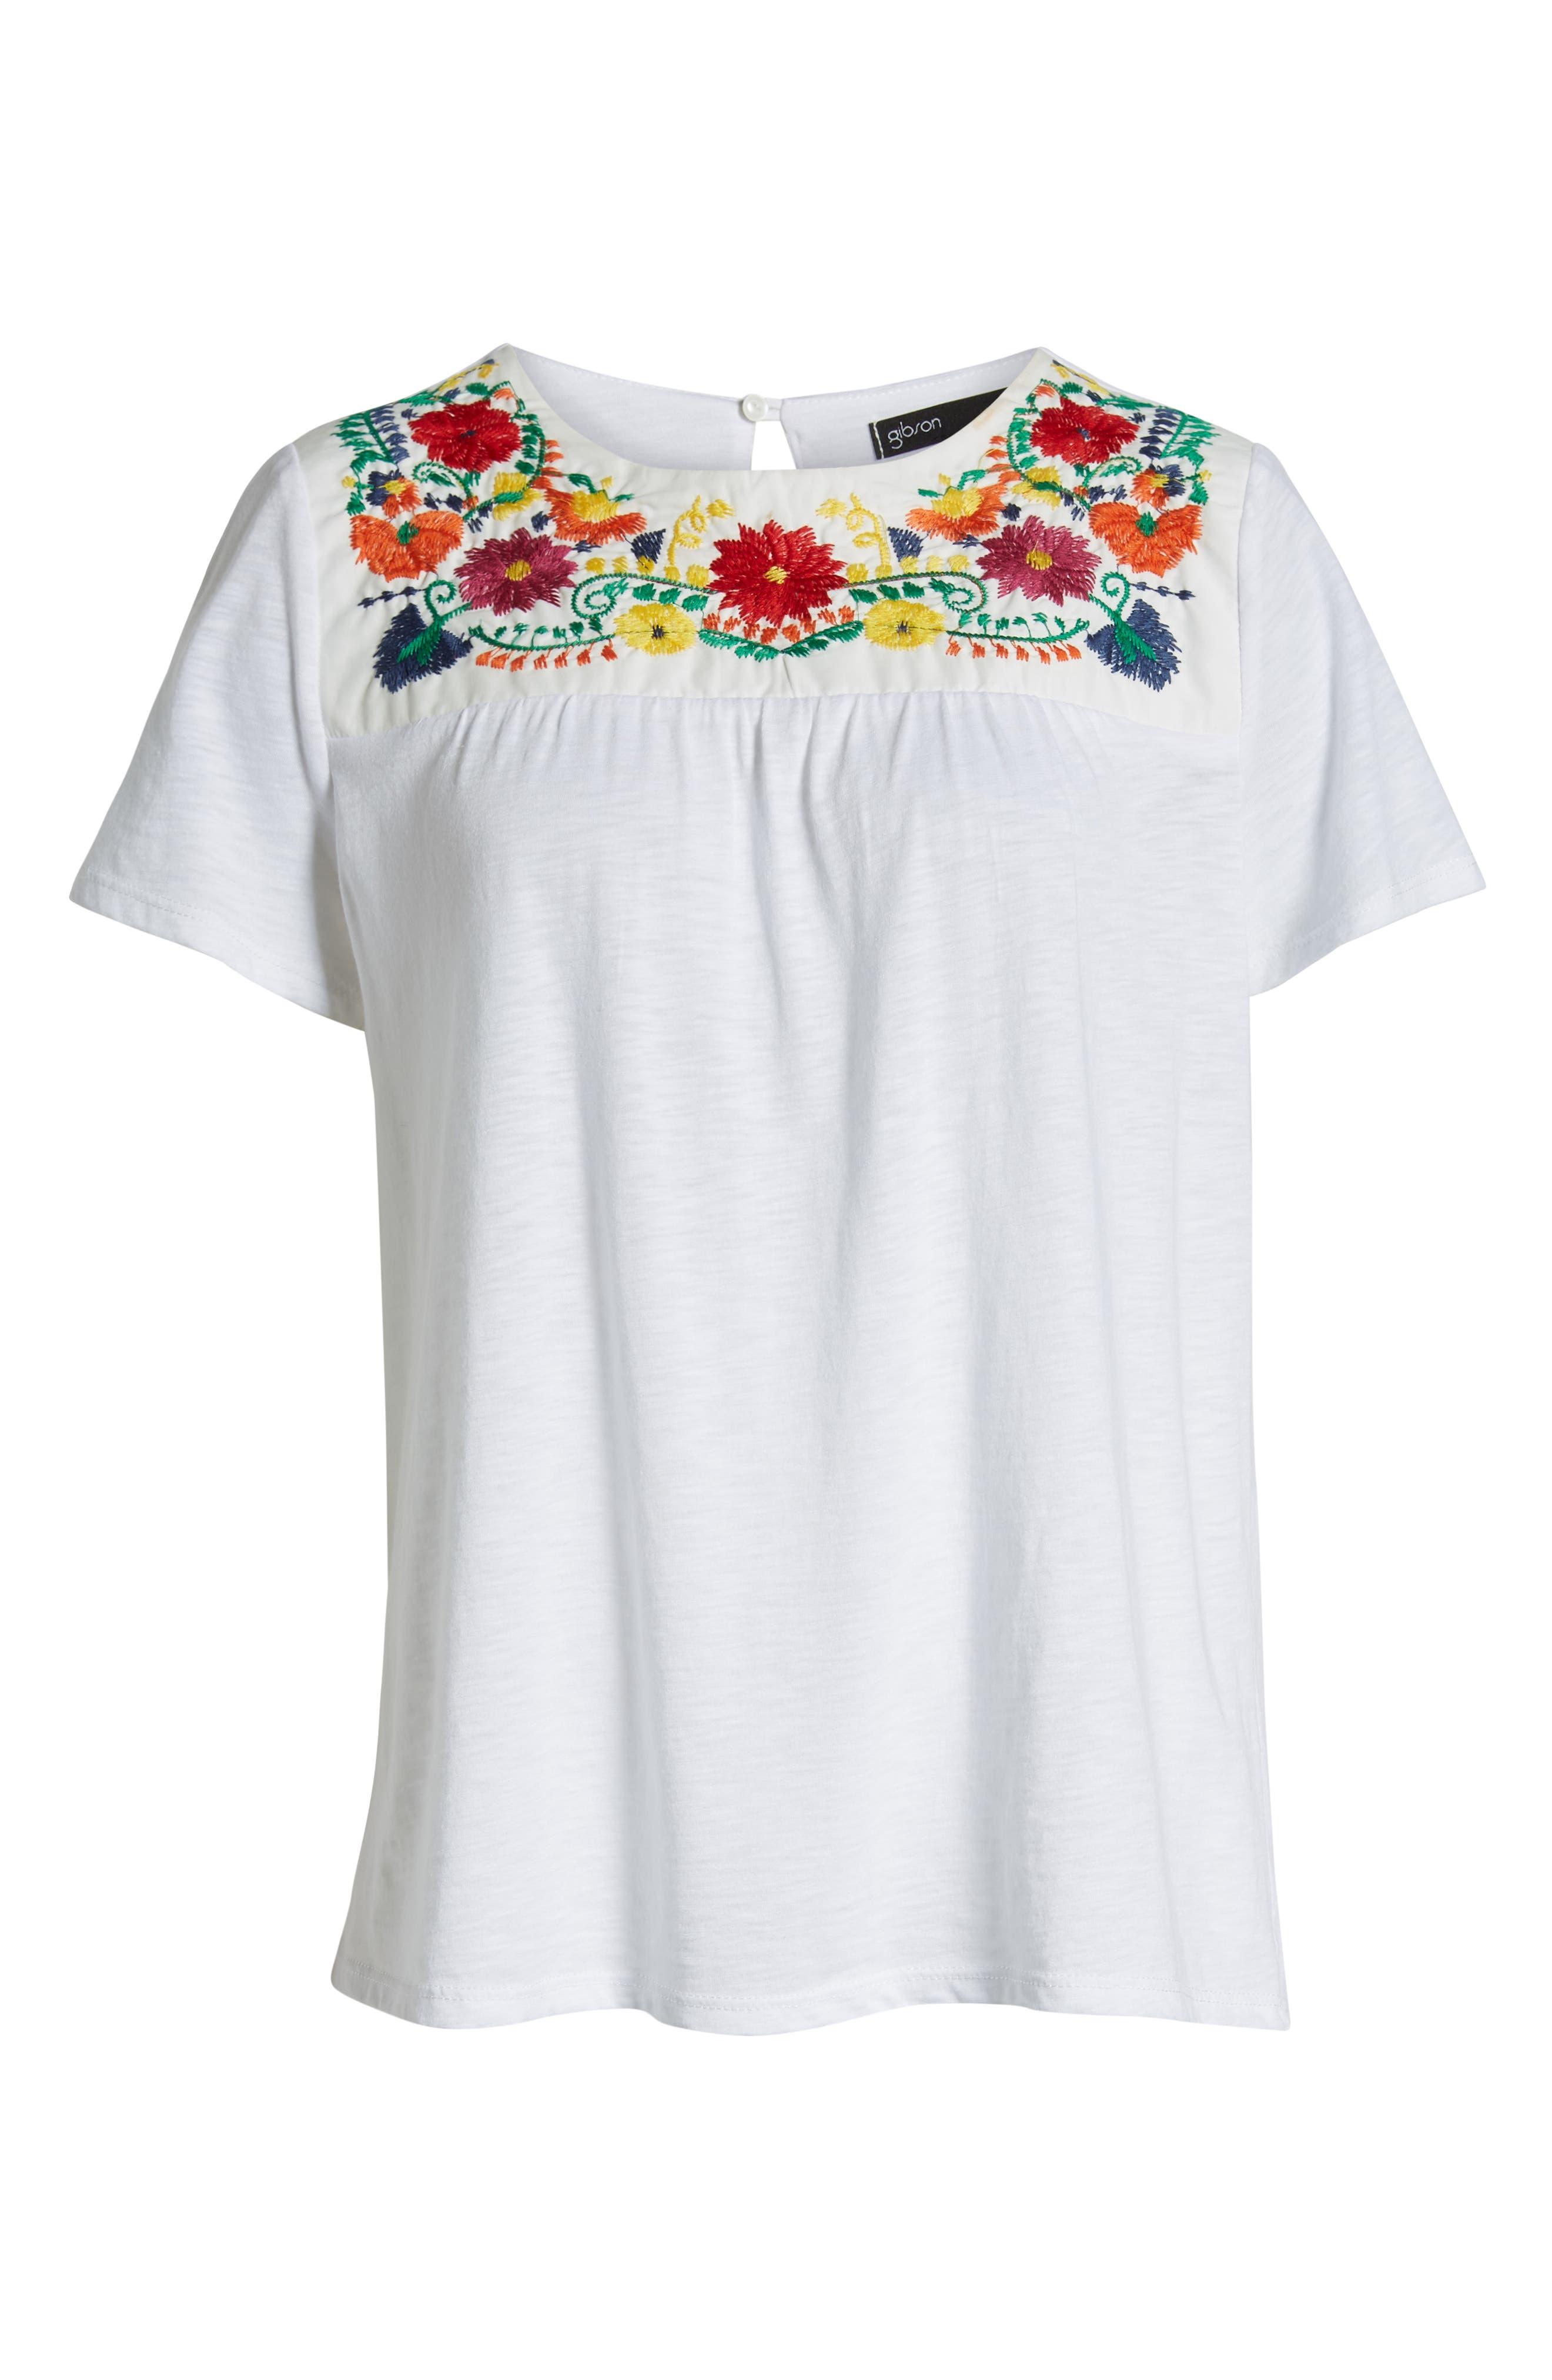 GIBSON, x Hi Sugarplum! Savannah Embroidered Yoke Tee, Alternate thumbnail 6, color, WHITE MULTI COLOR